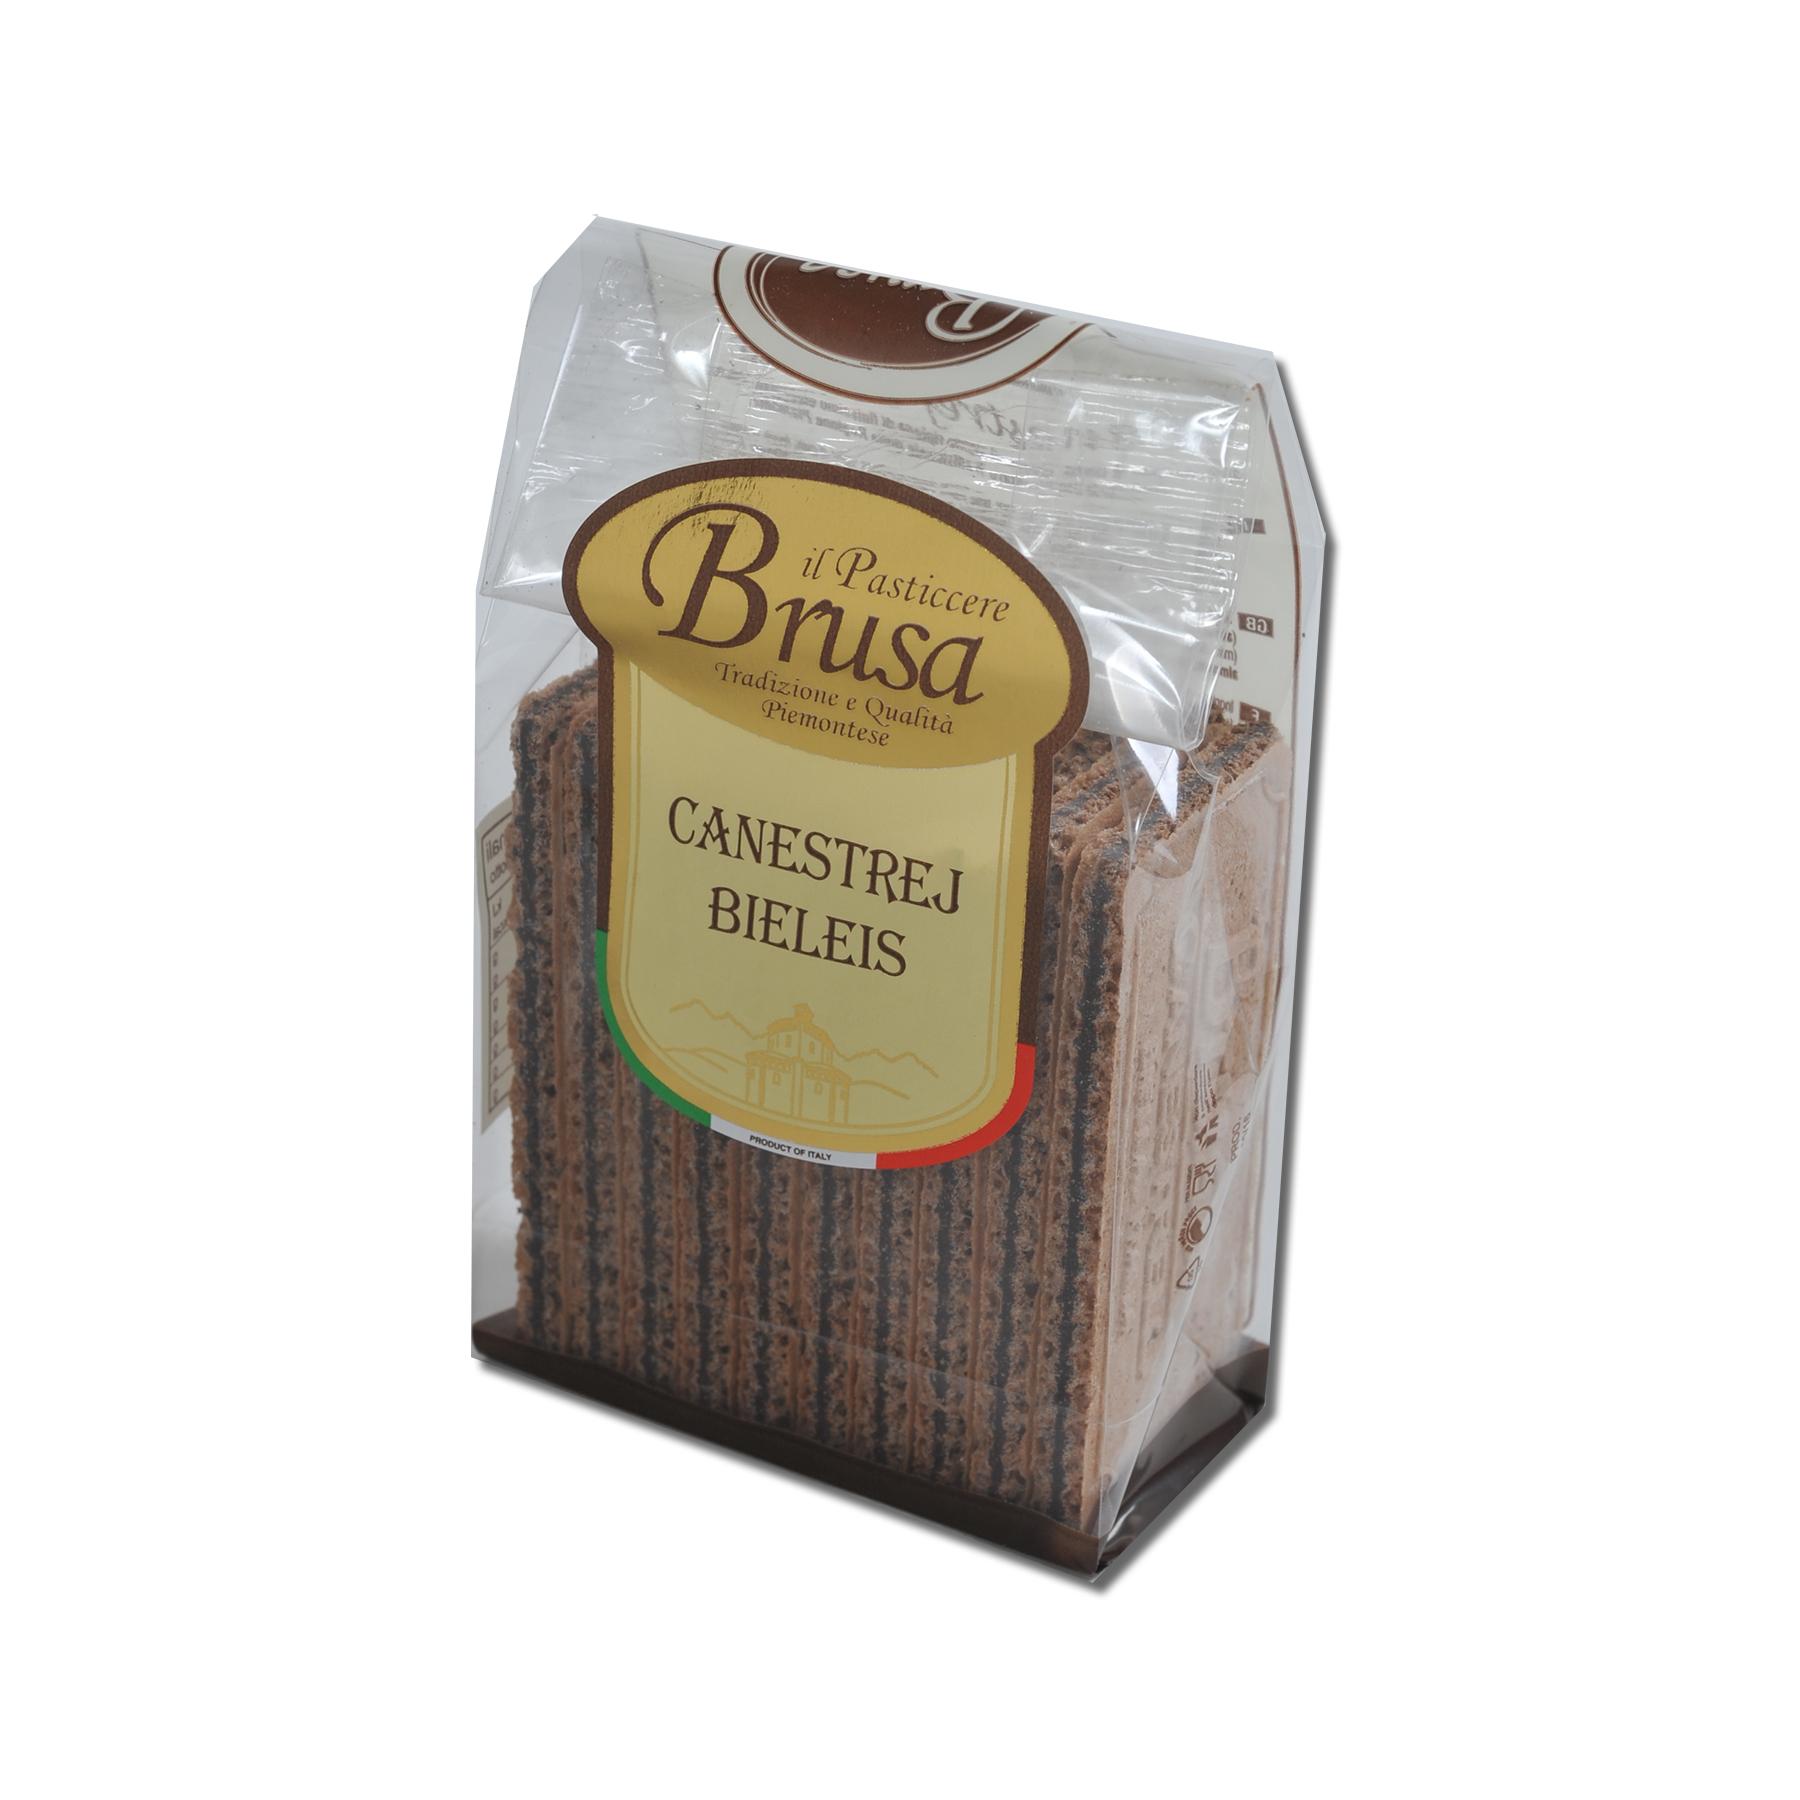 canestrelli-biellesi饼干-150g